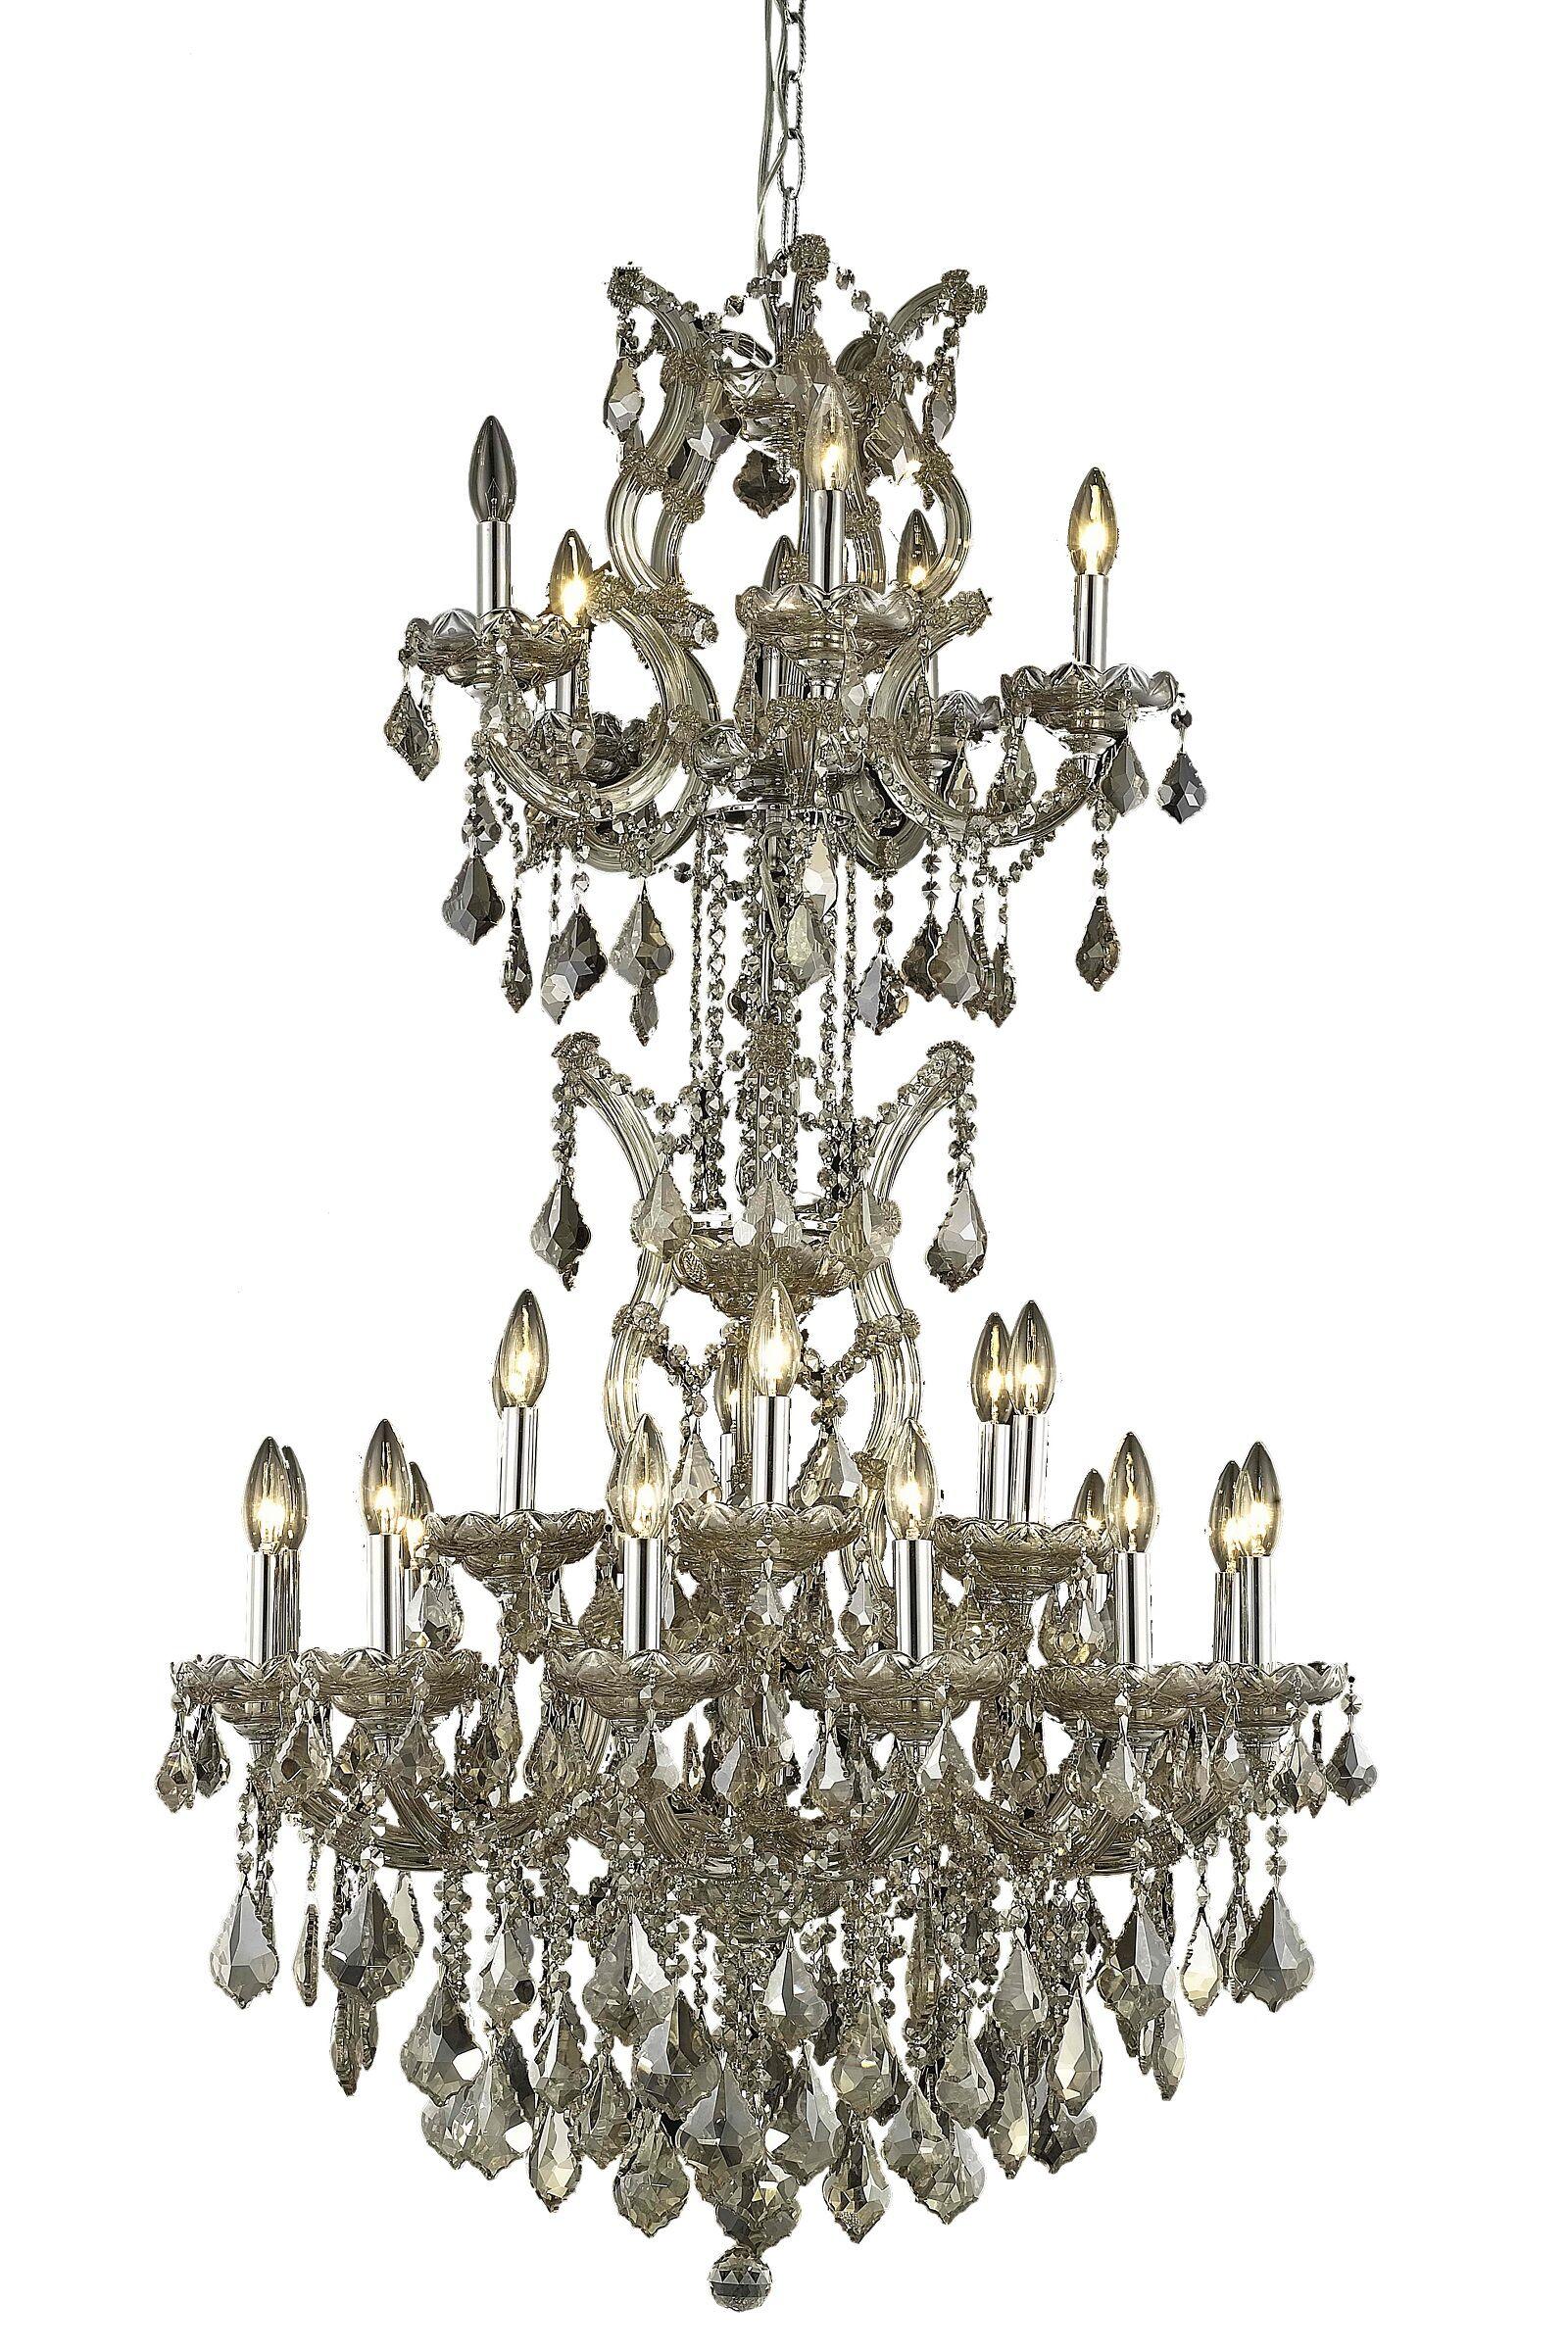 Regina 25-Light Candle Style Chandelier Finish / Crystal Finish / Crystal Trim: Golden Teak / Golden Teak (Smoky) / Royal Cut